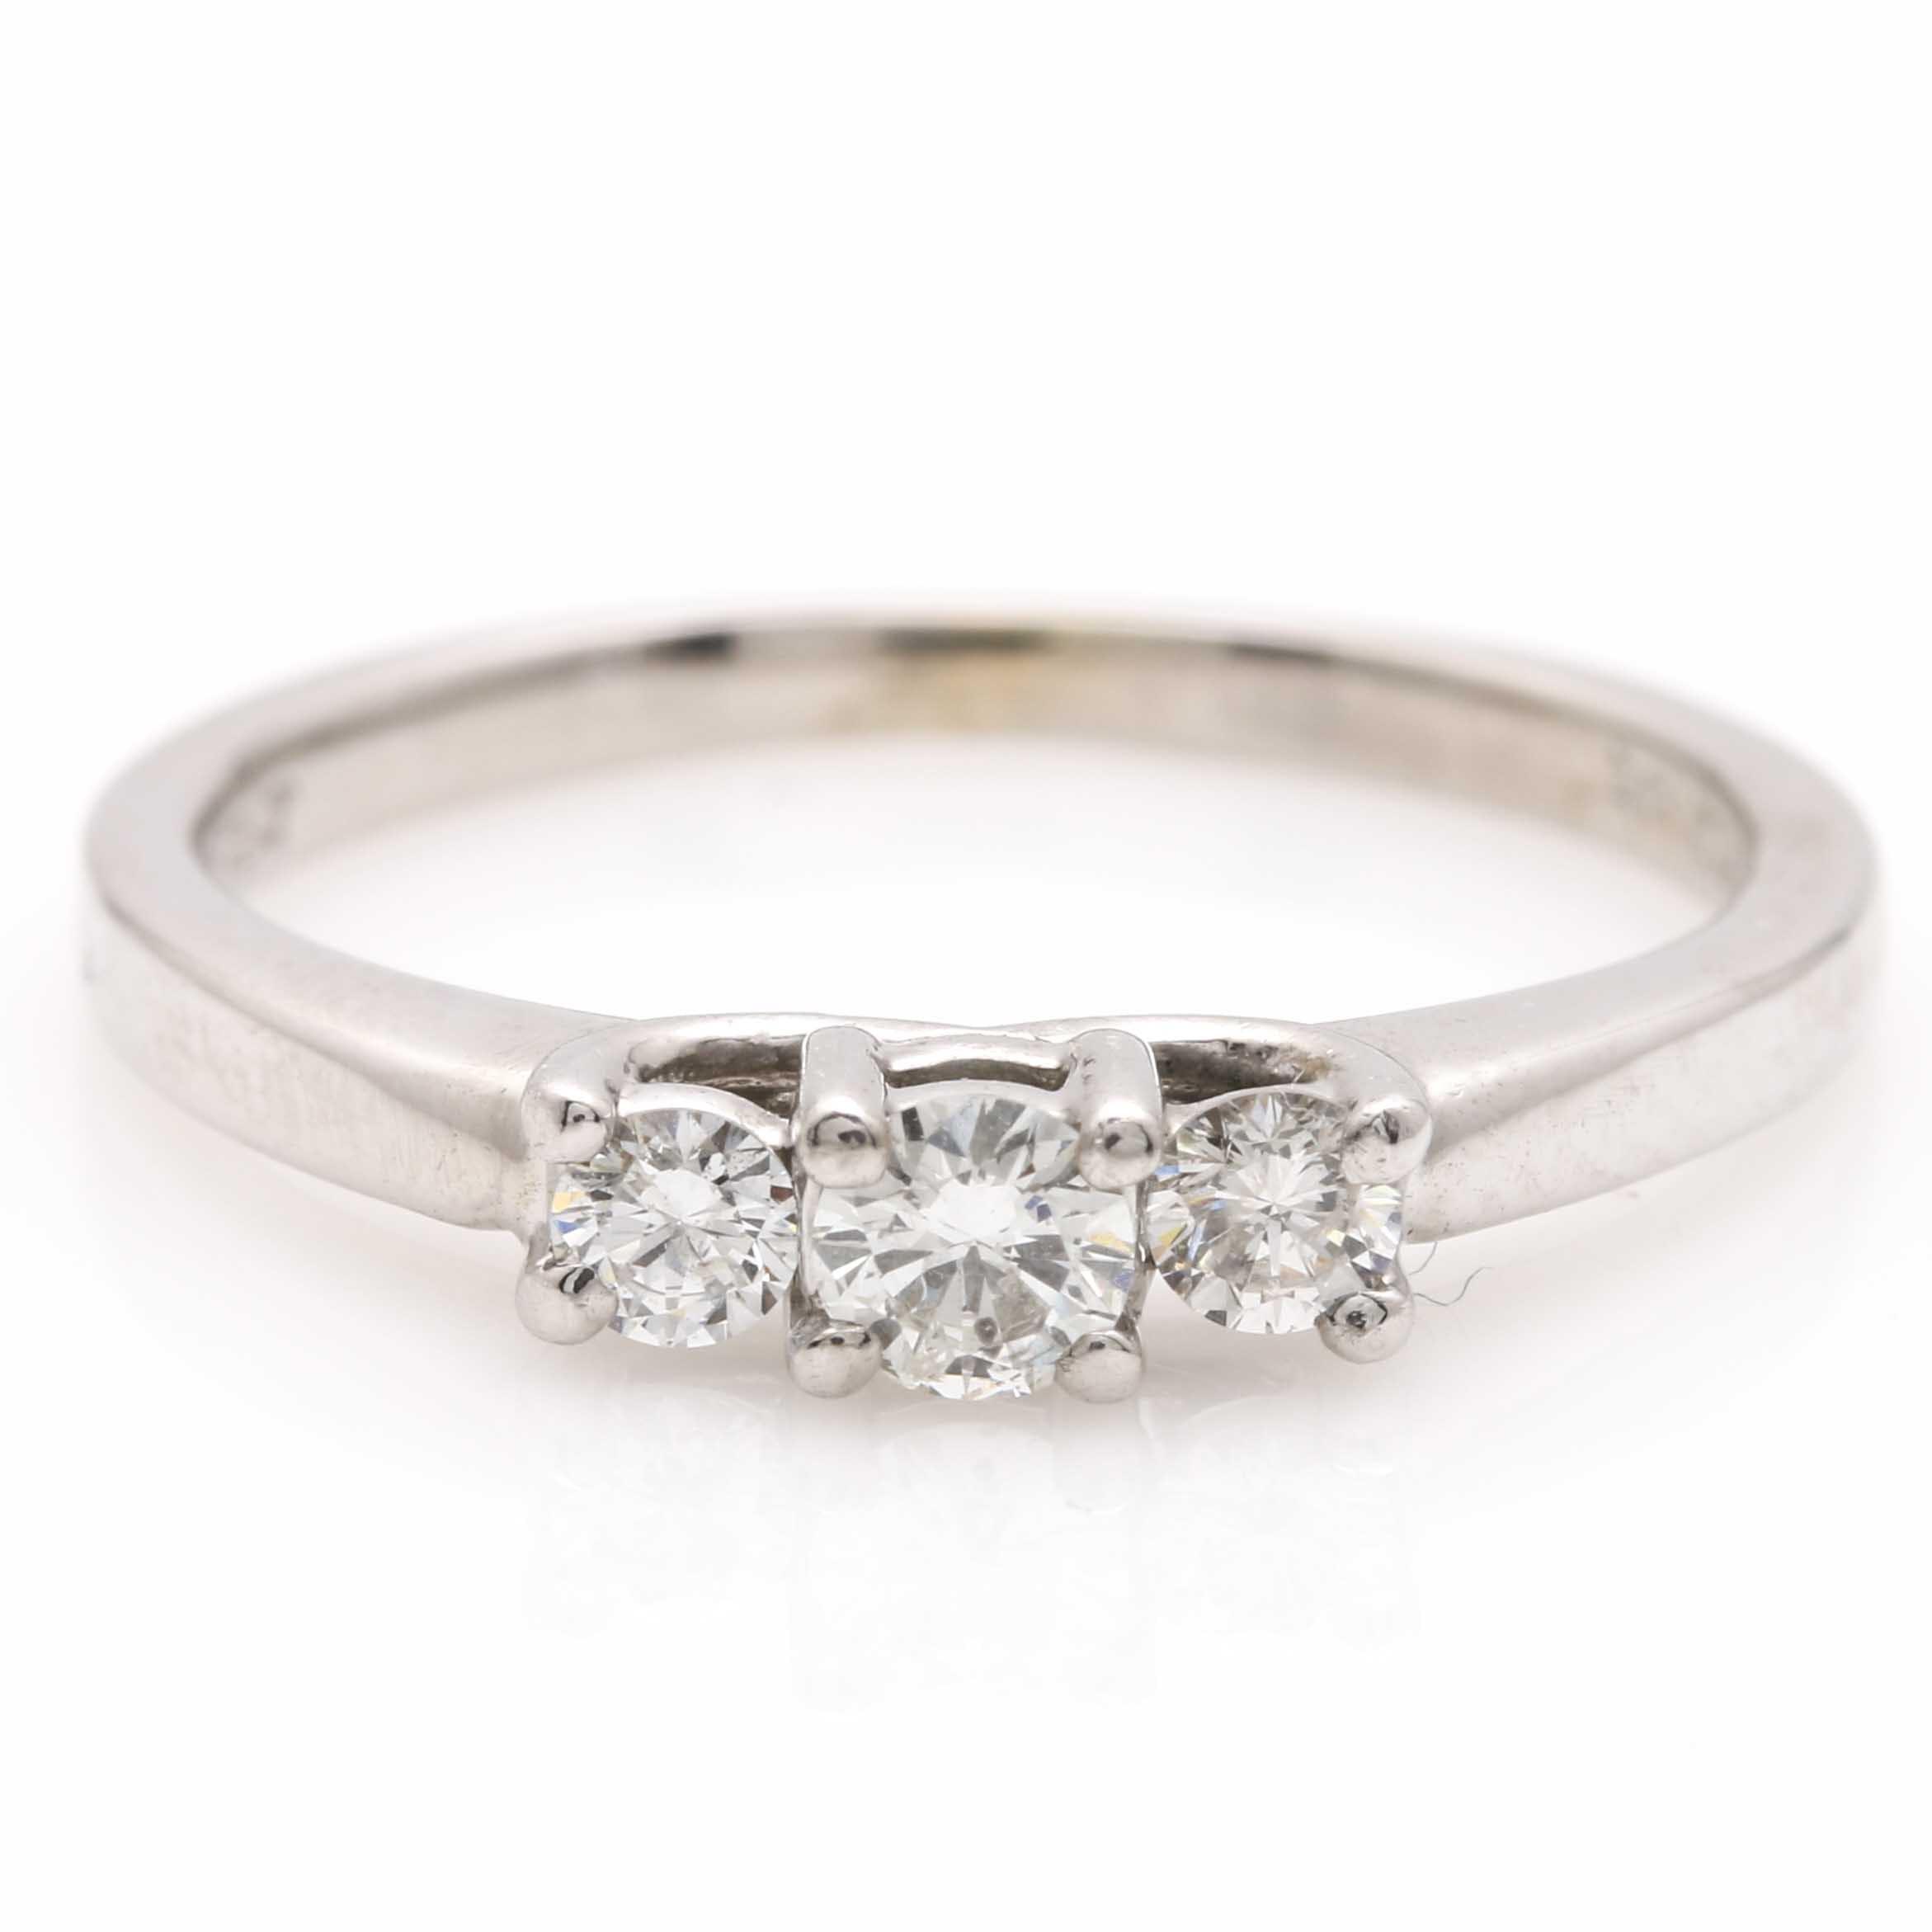 Magic-Glo 14K White Gold and Platinum Diamond Ring